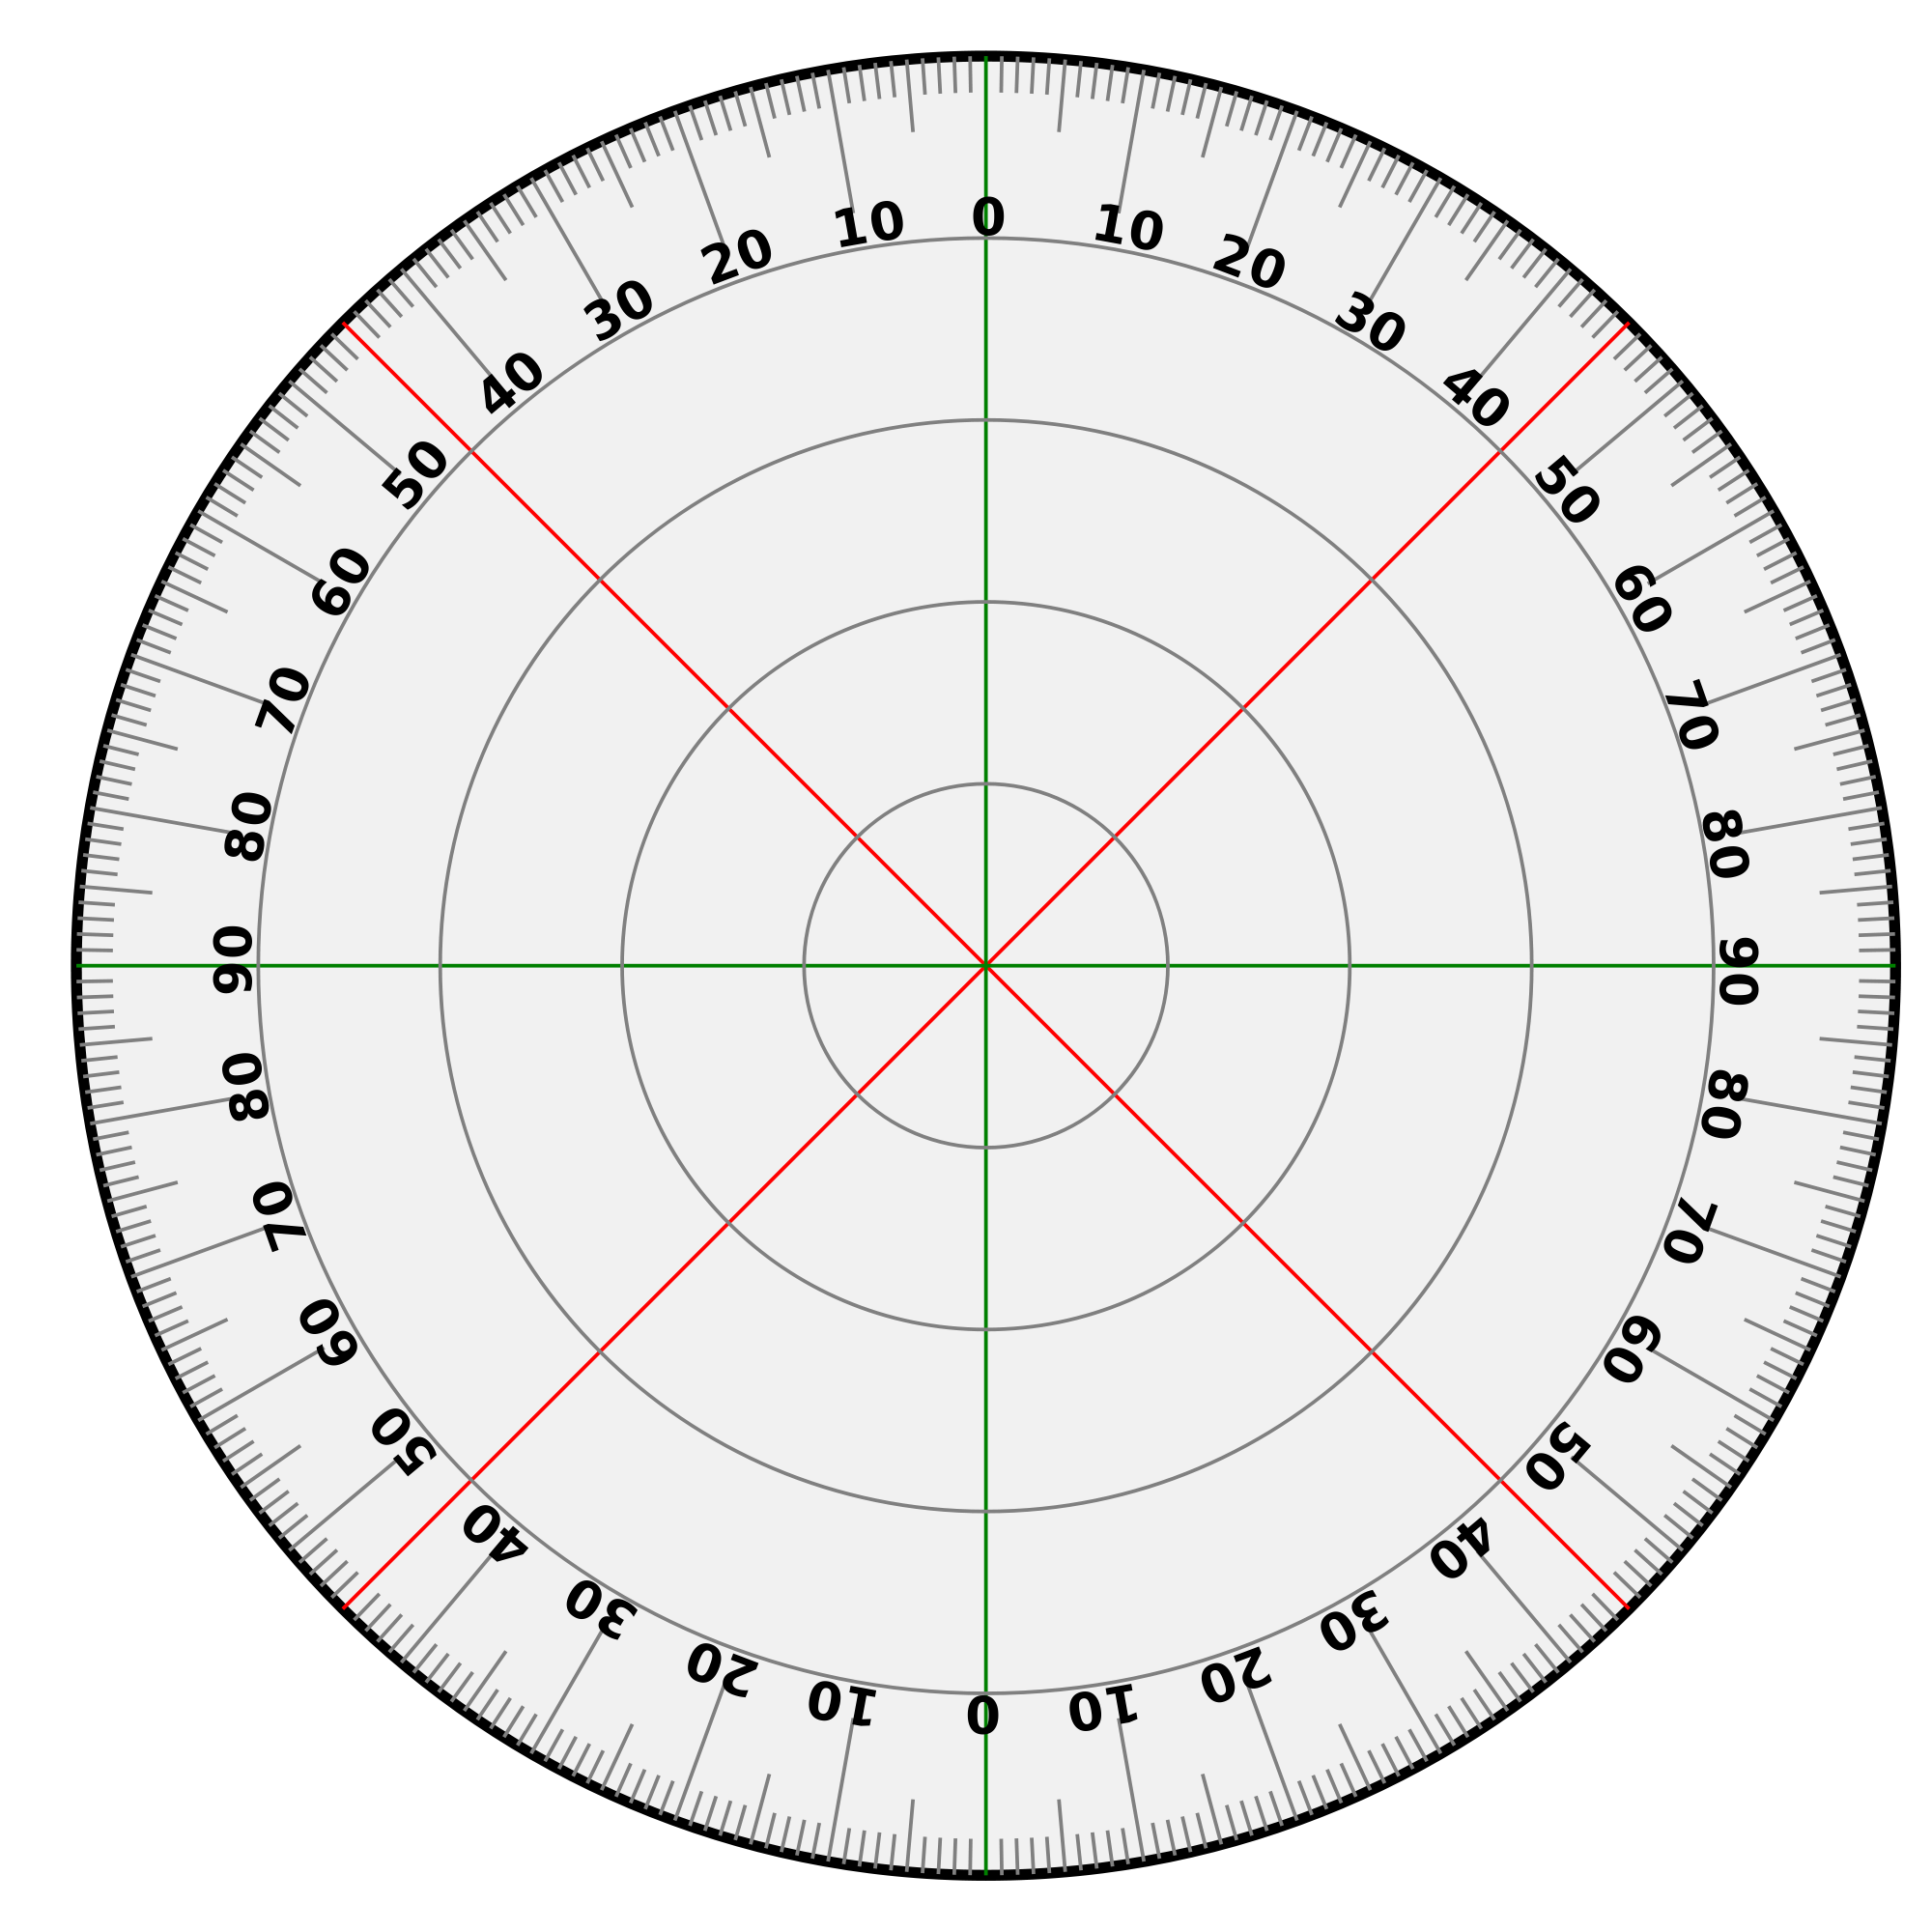 60 Degree Angle Template